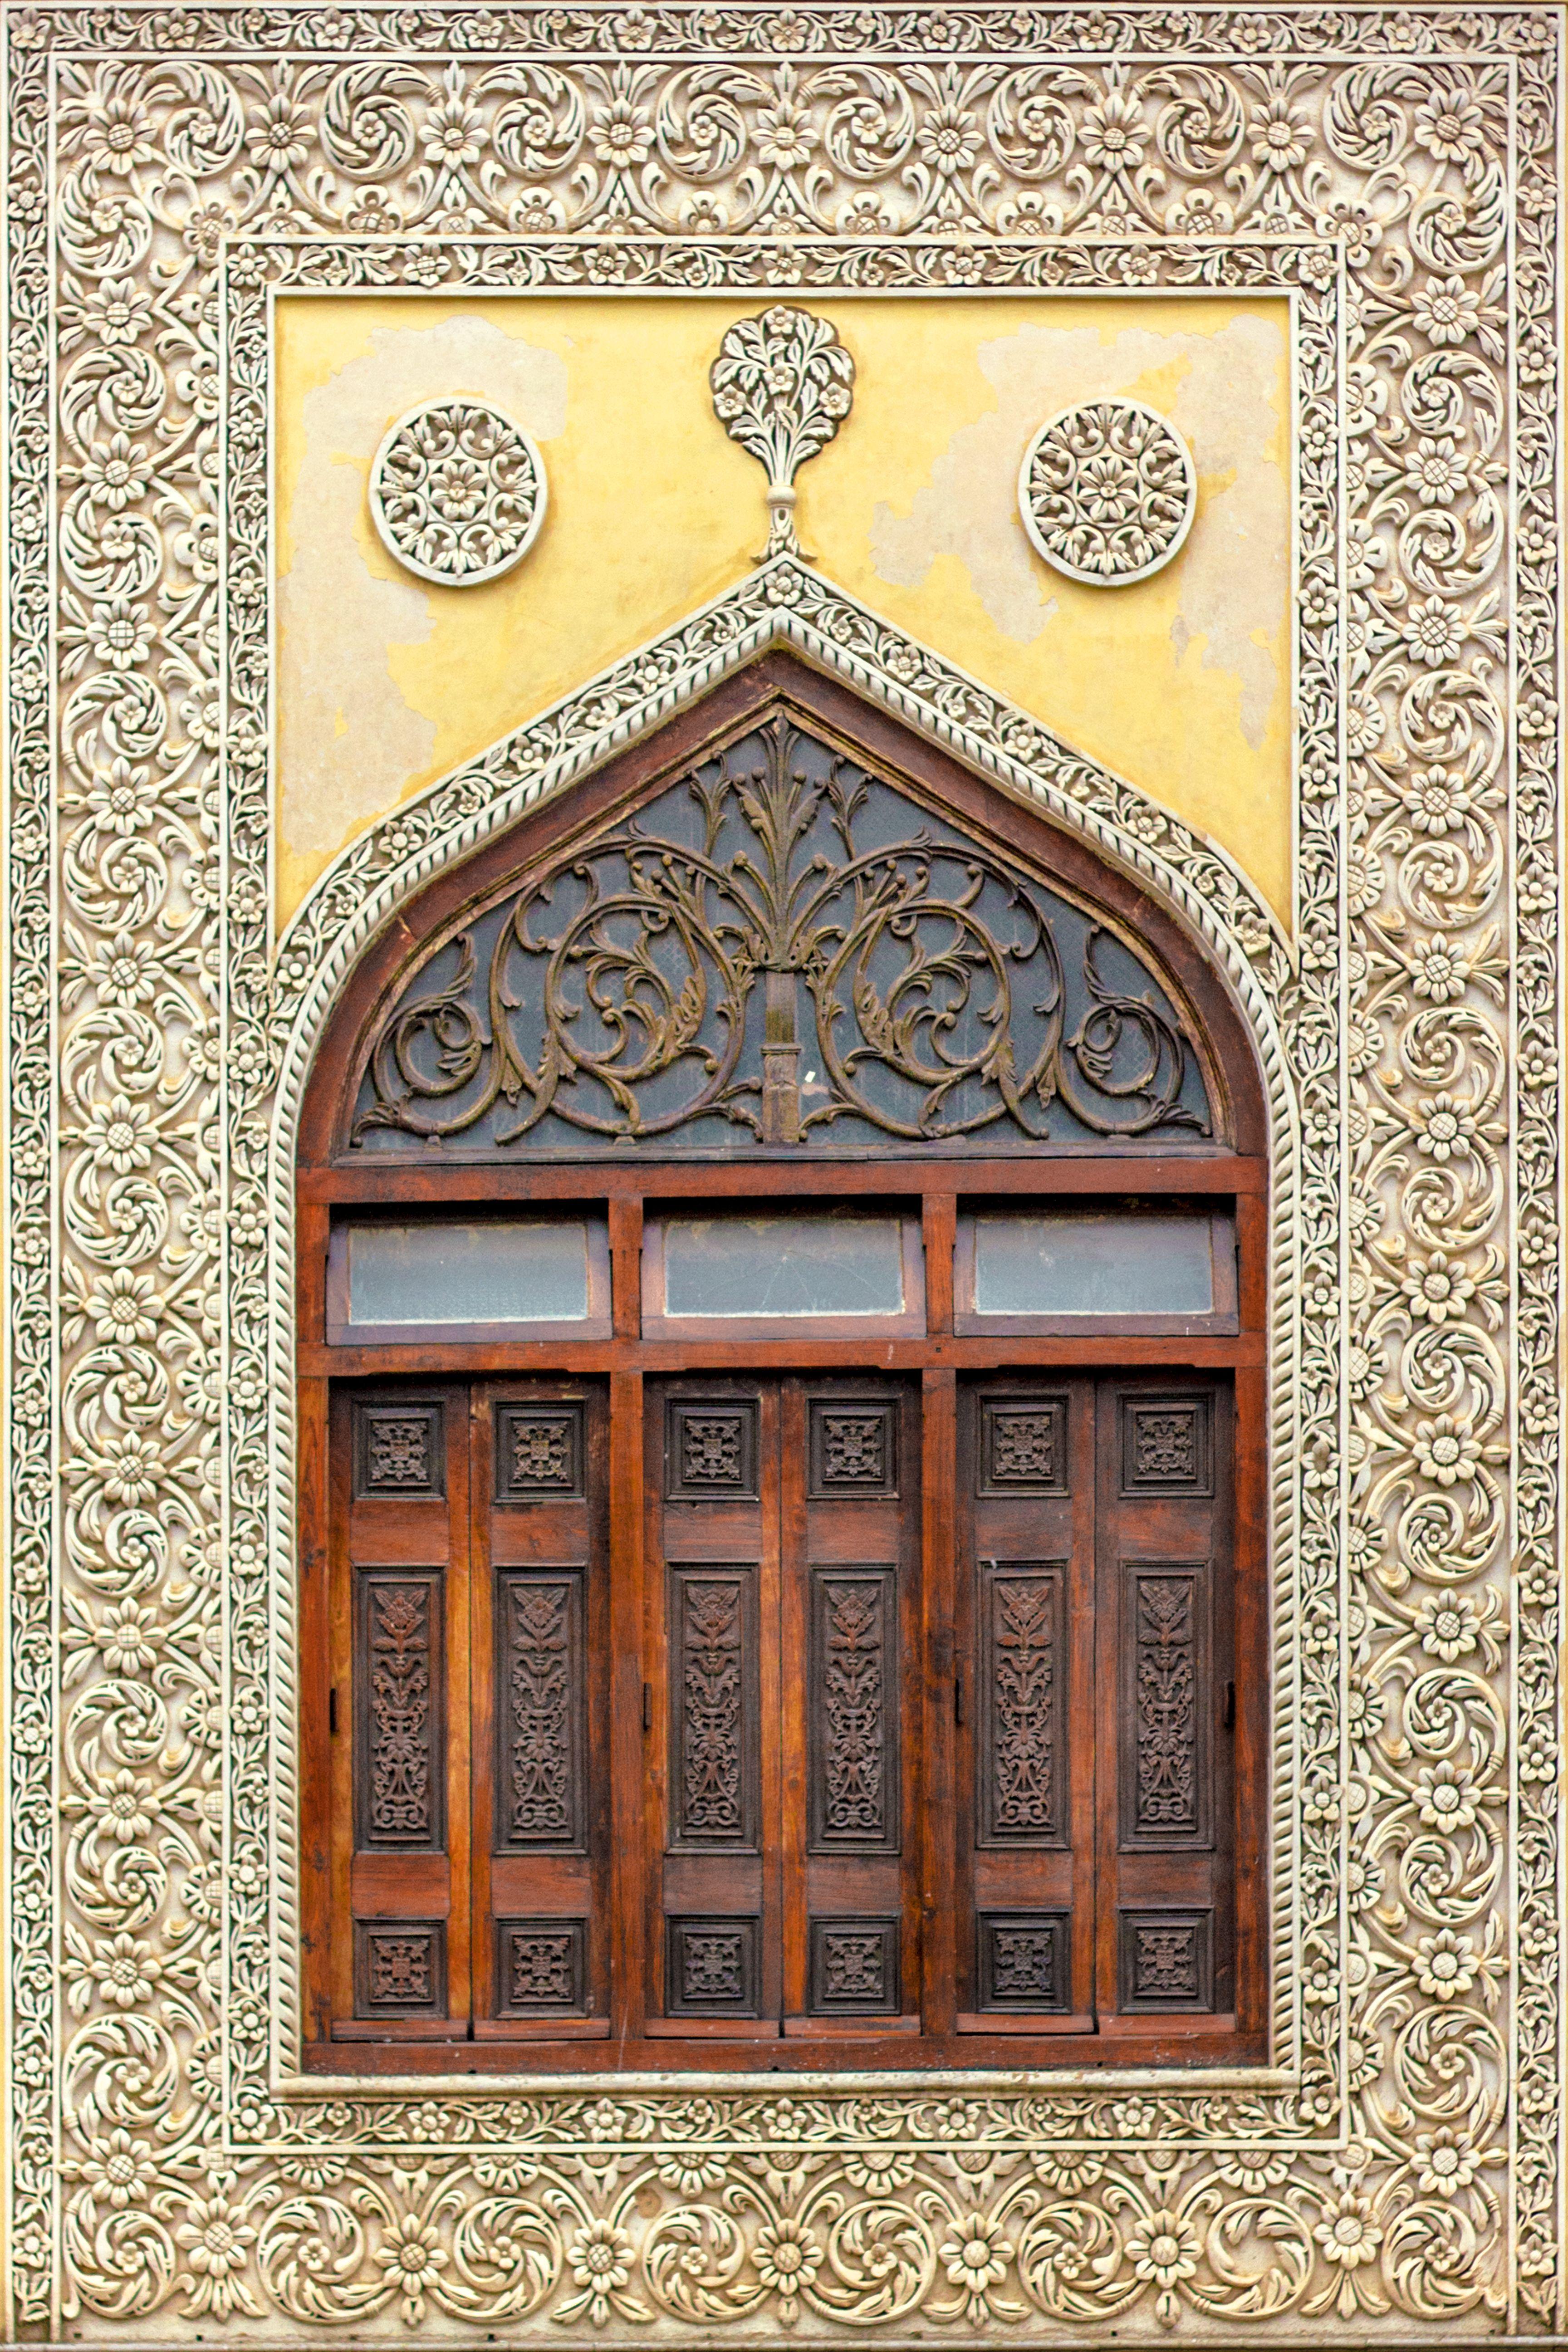 Chowmalla Palace window on Durbar hall of the Nizams of Hyderabad